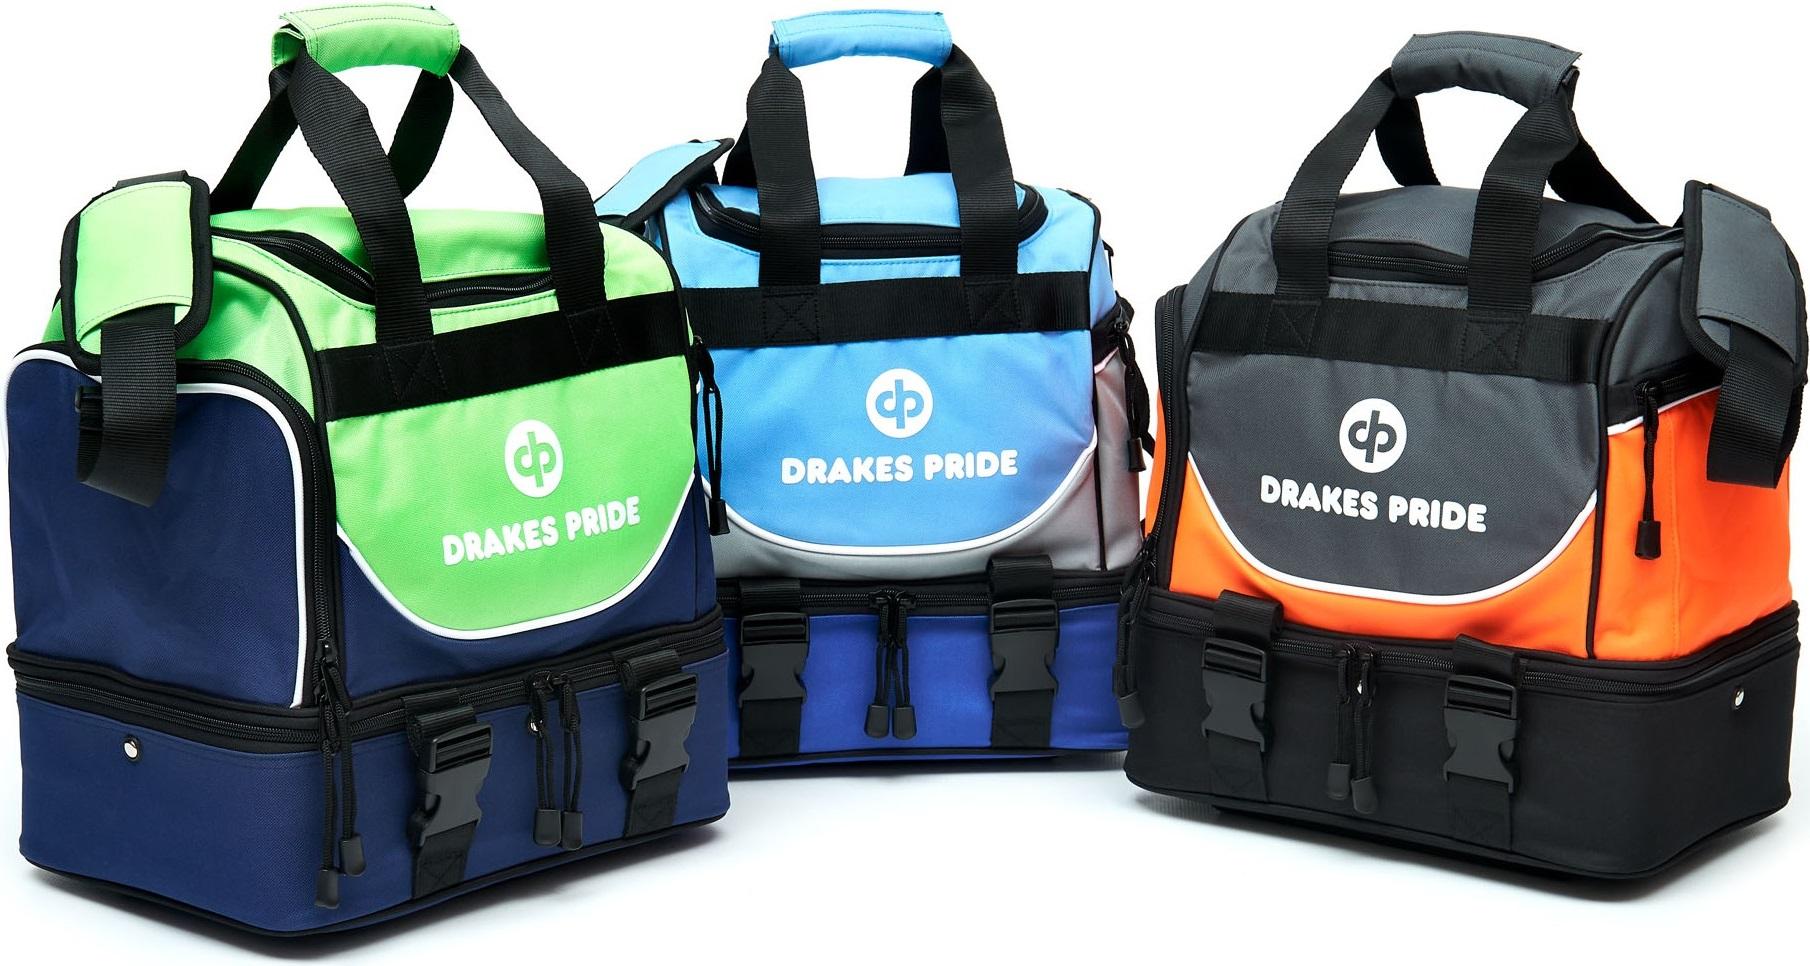 Drakes Pride Midi Bowls Bag